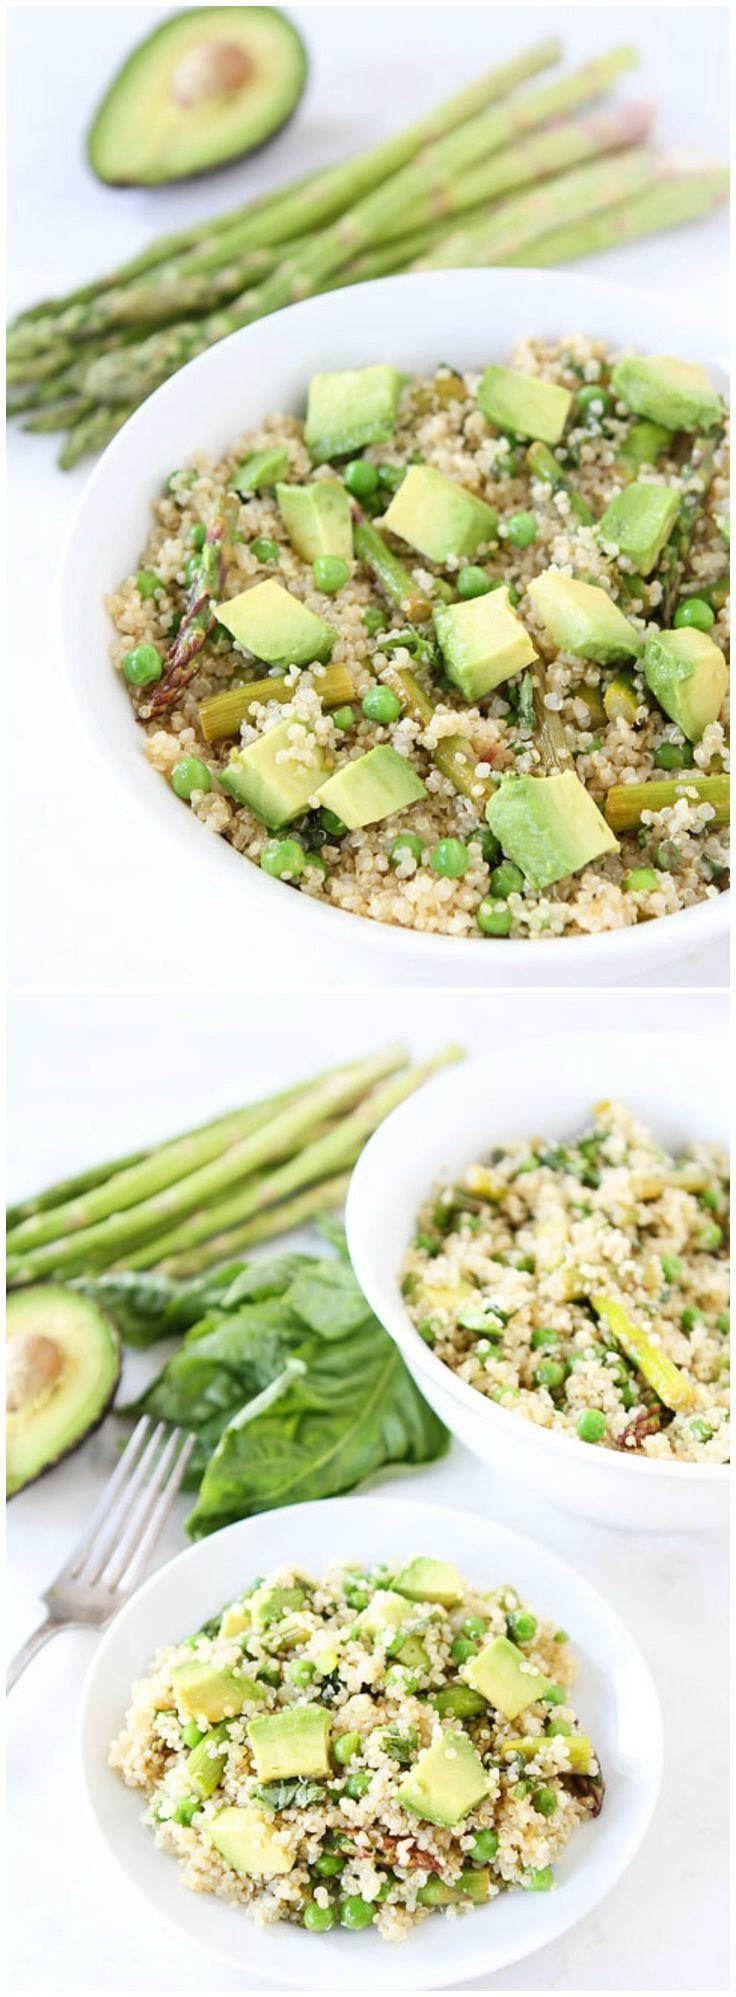 Spring Quinoa Salad Recipe on twopeasandtheirpod.com Quinoa salad with asparagus, peas, avocado, and a simple lemon basil dressing. We LOVE this healthy salad!